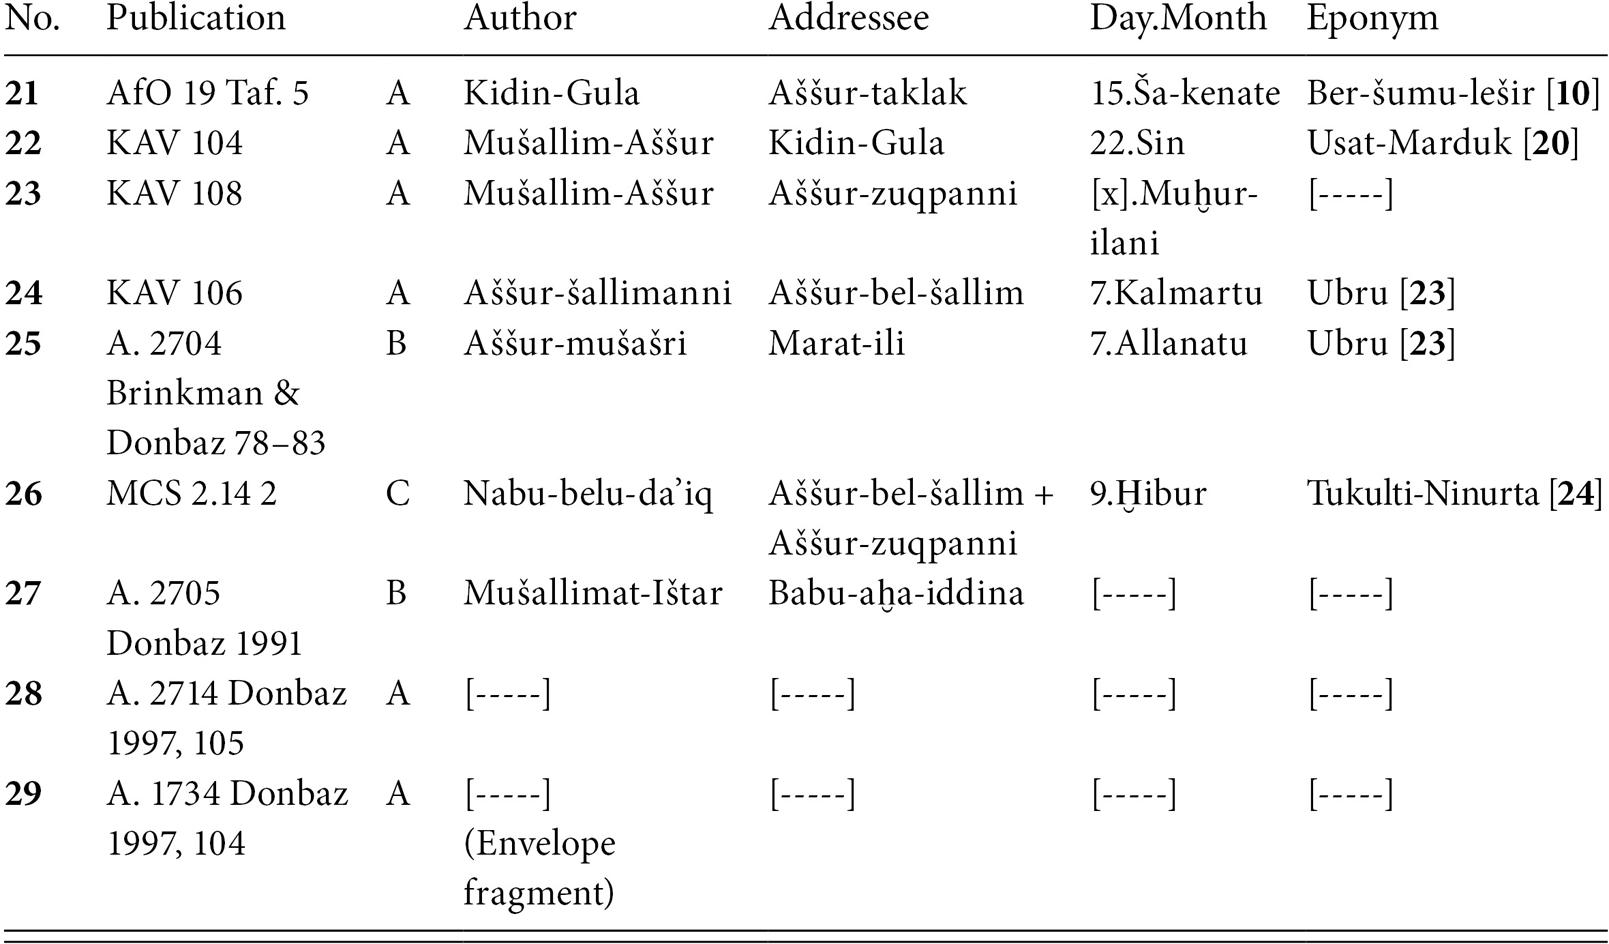 Archives at Aššur (Chapter 4) - Bronze Age Bureaucracy